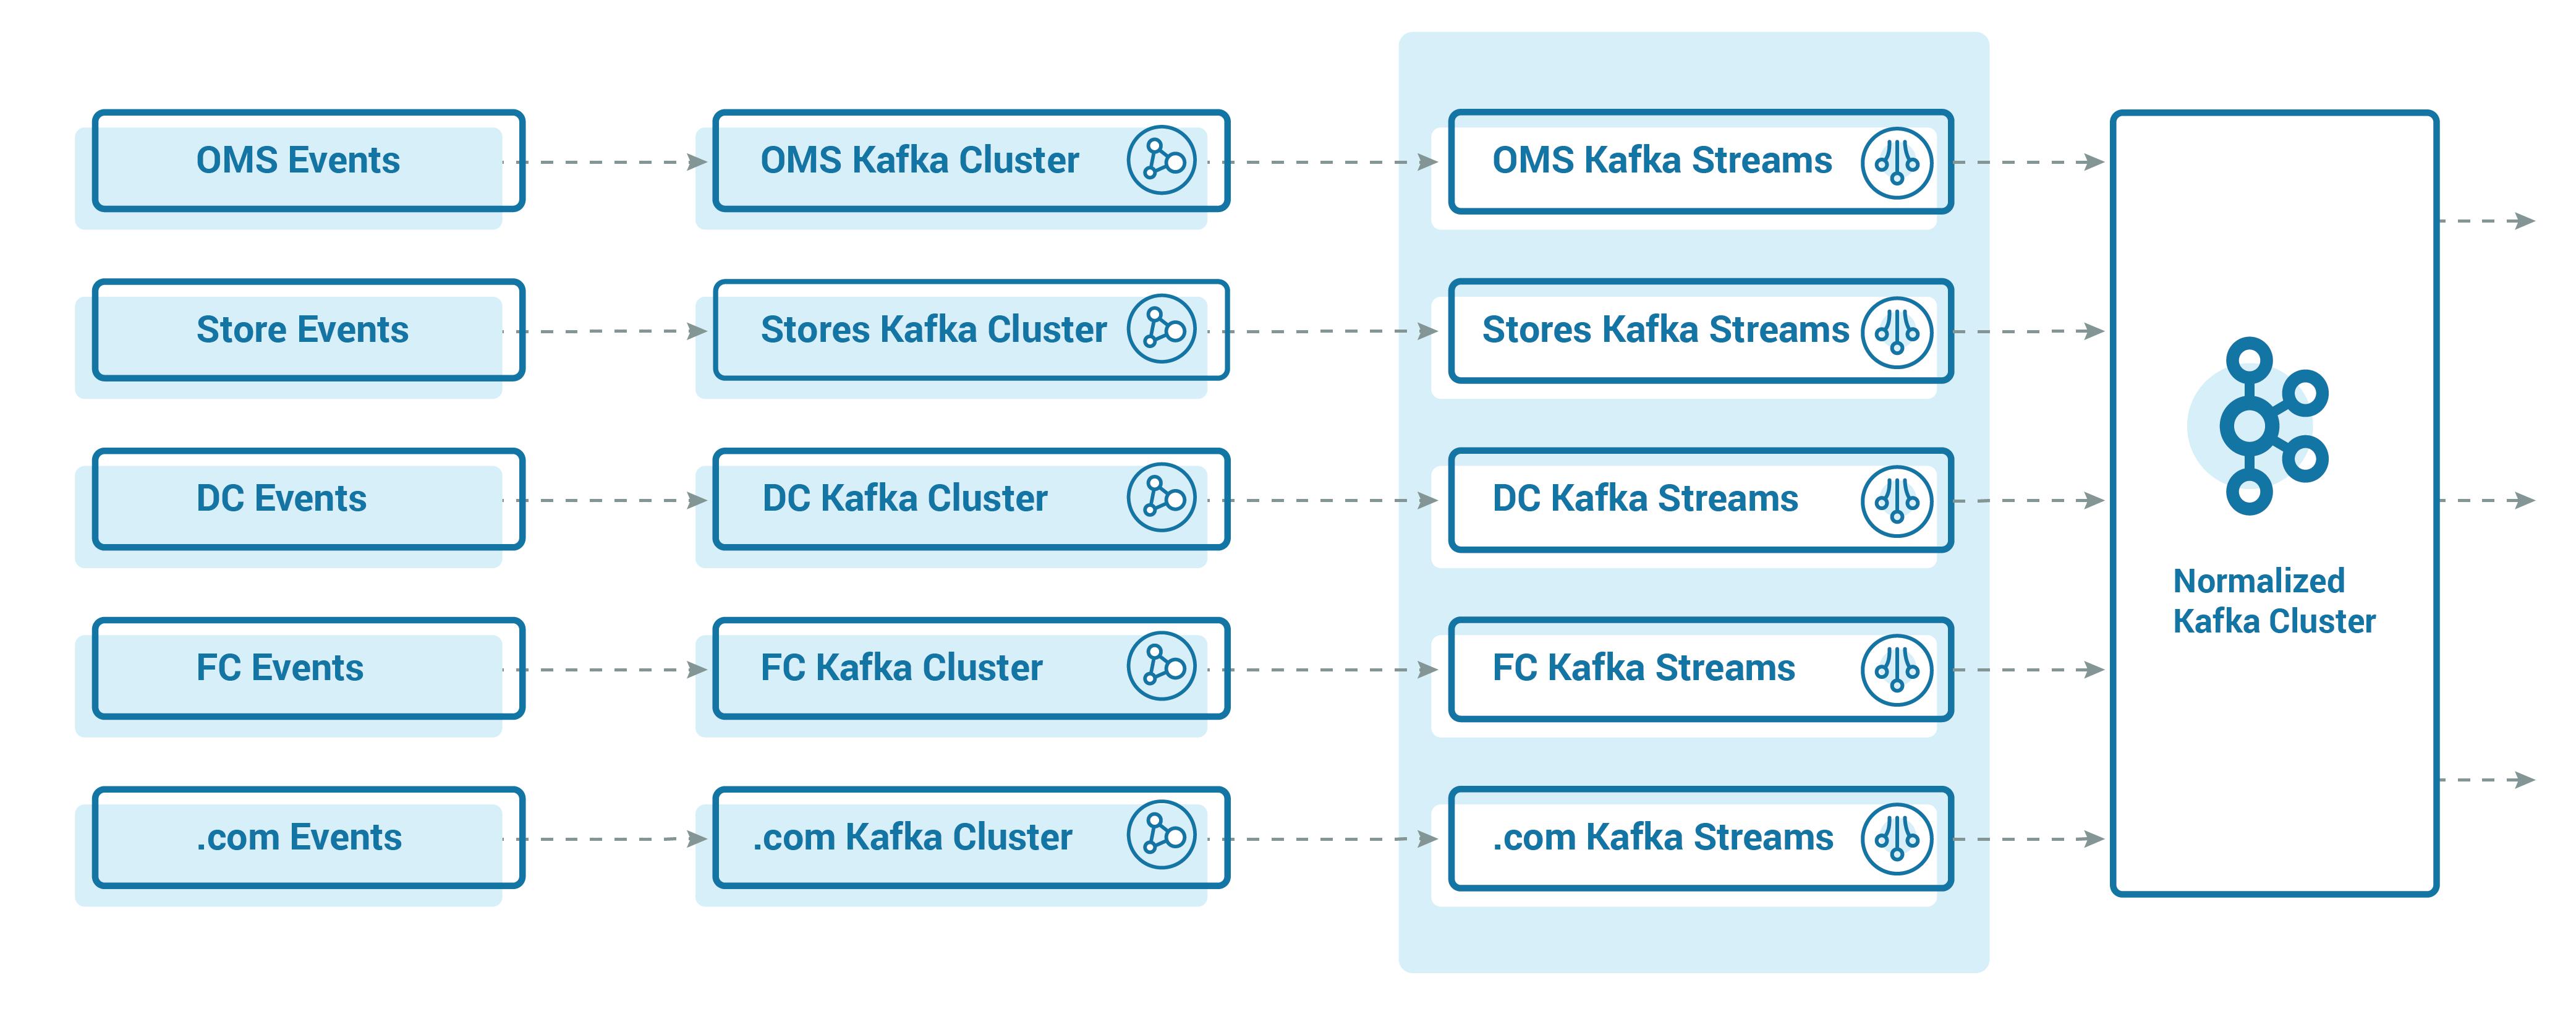 Events ➝ Kafka Cluster ➝ Kafka Streams ➝ Normalized Kafka Cluster